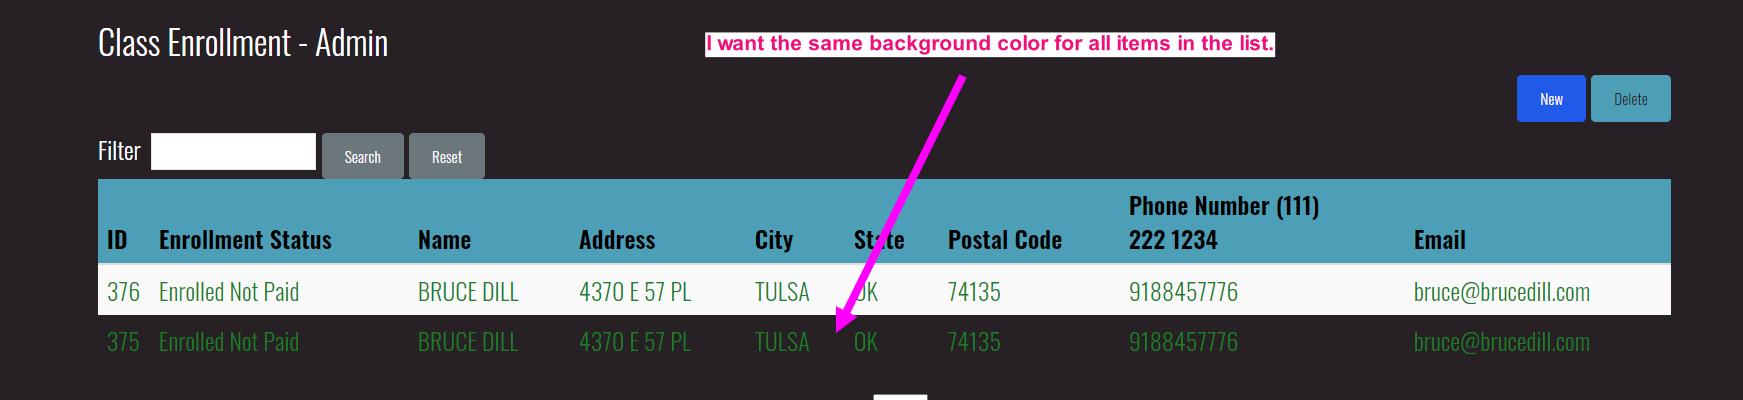 Screenshot02-19-202102.58.53.png